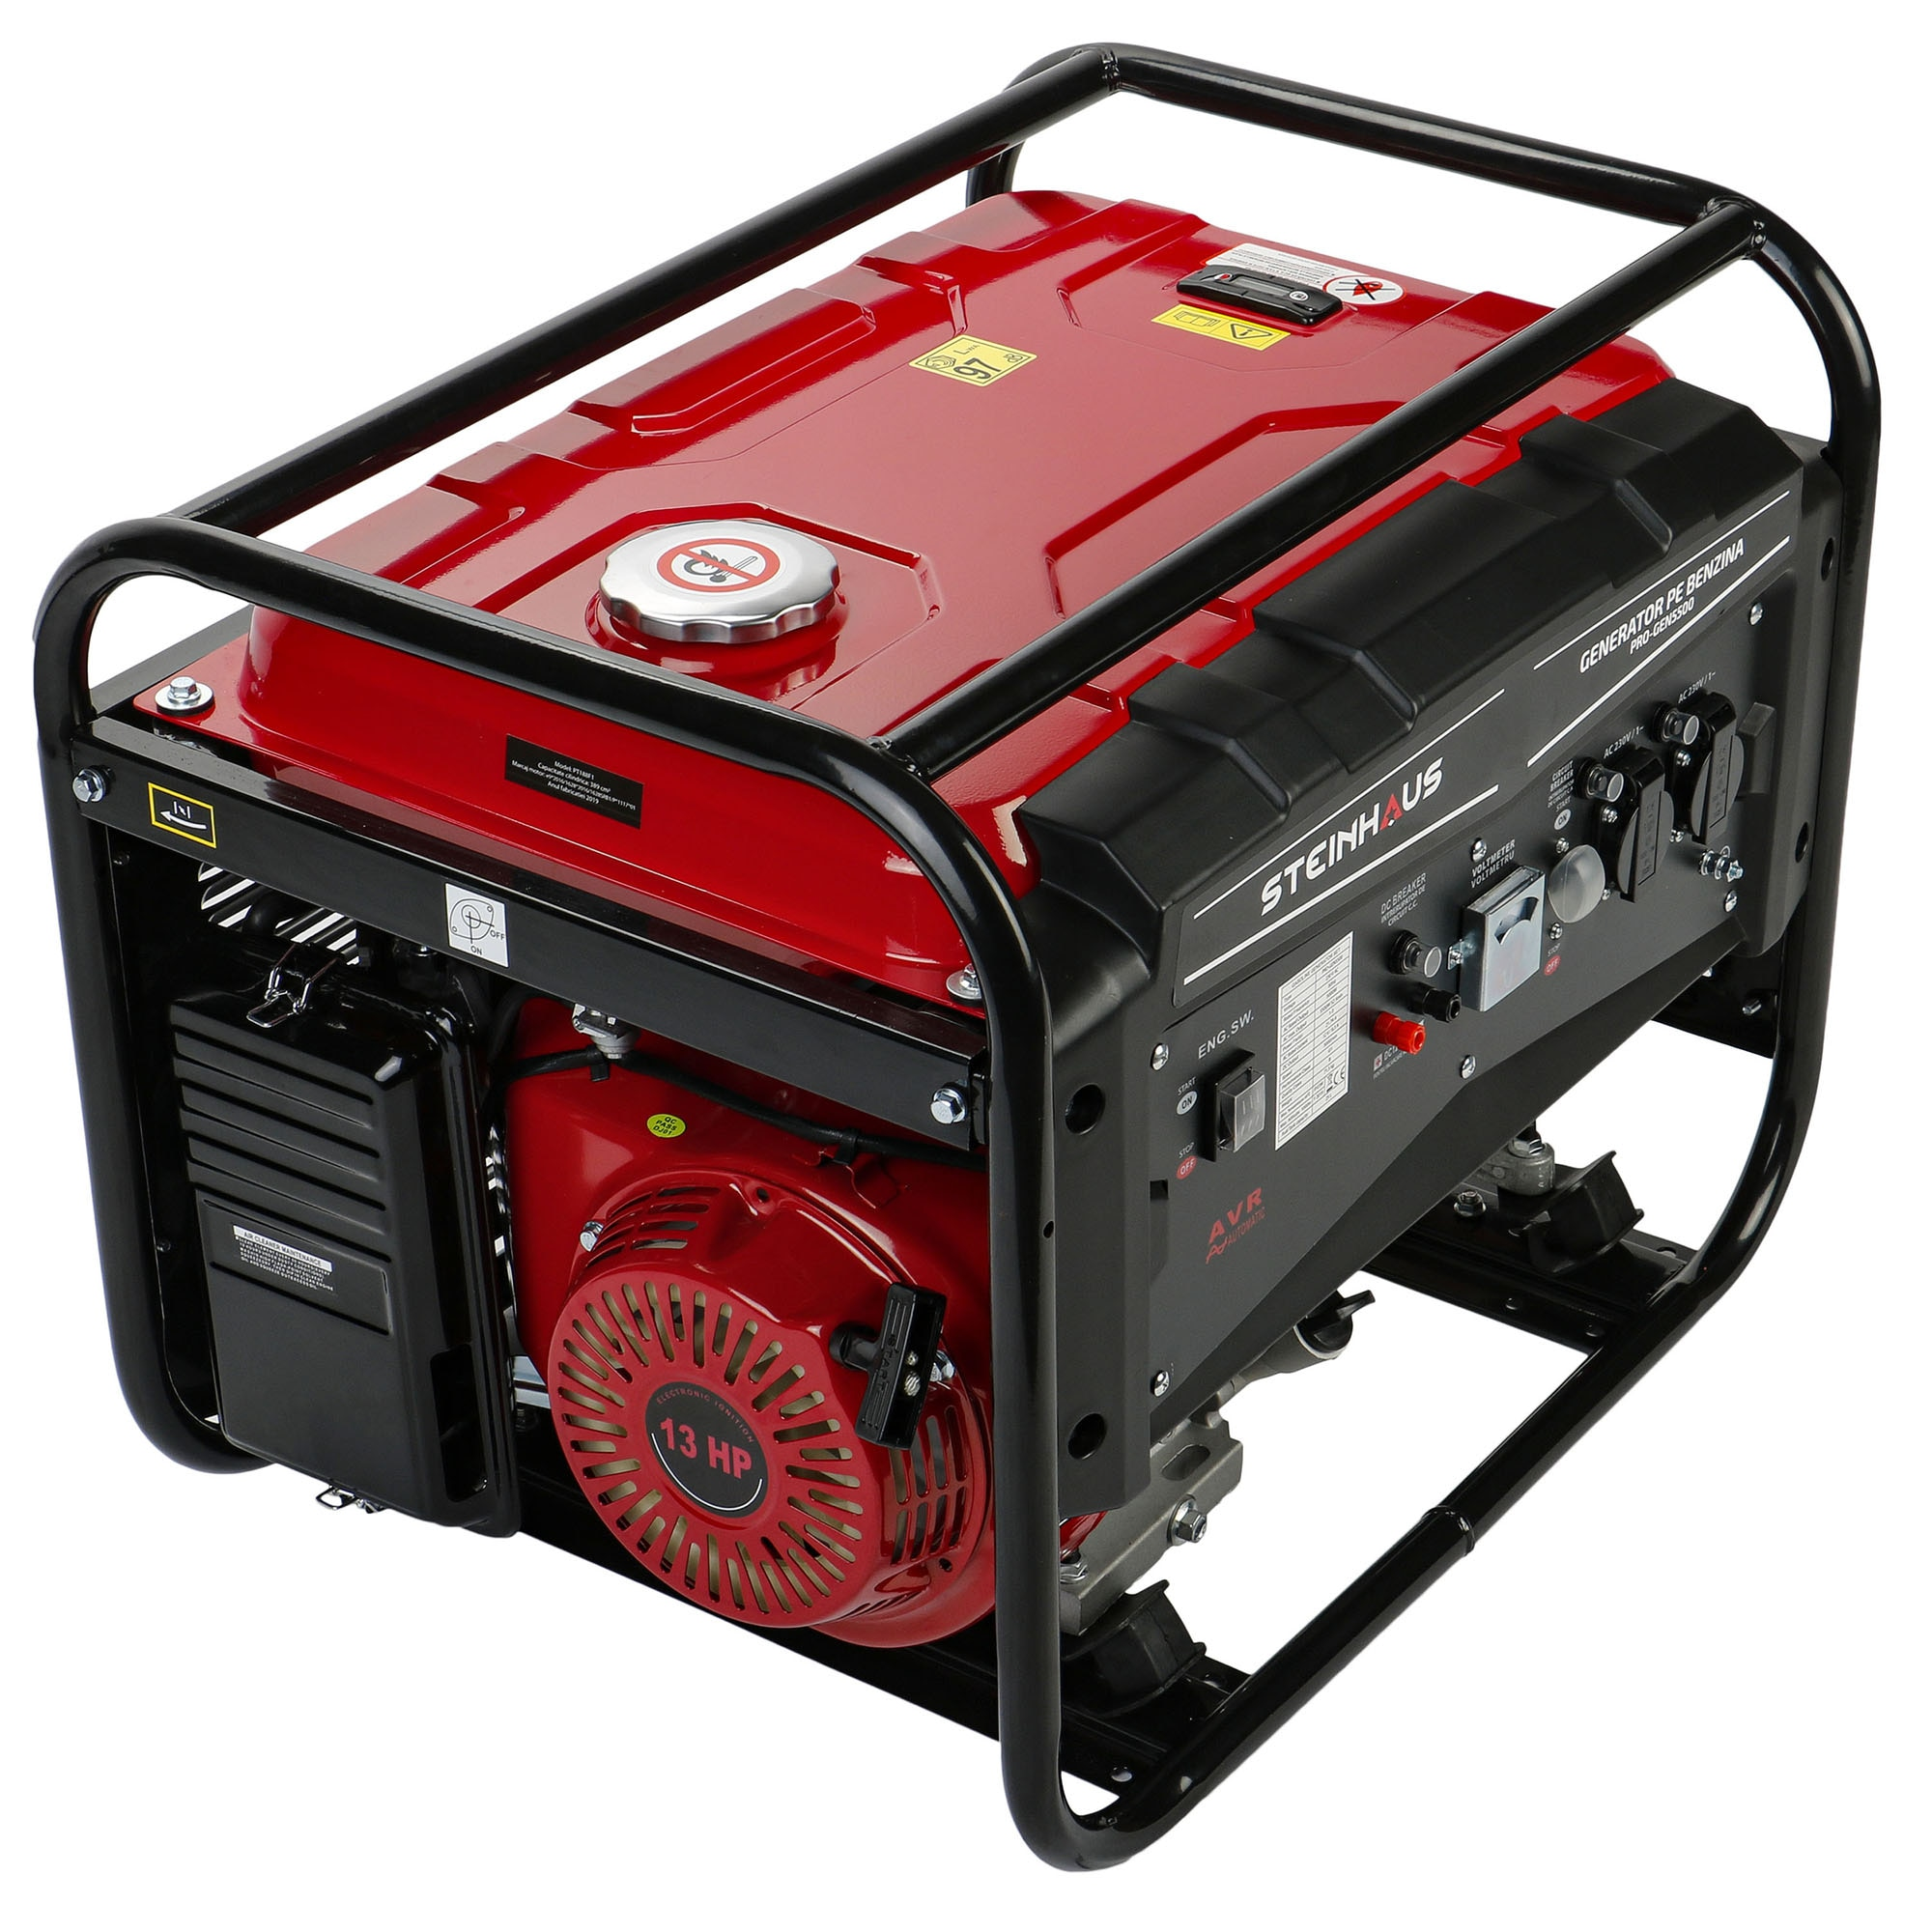 Fotografie Generator curent electric Steinhaus PRO-GEN5500, 5500 W cu stabilizator de tensiune, benzina, autonomie 11 h